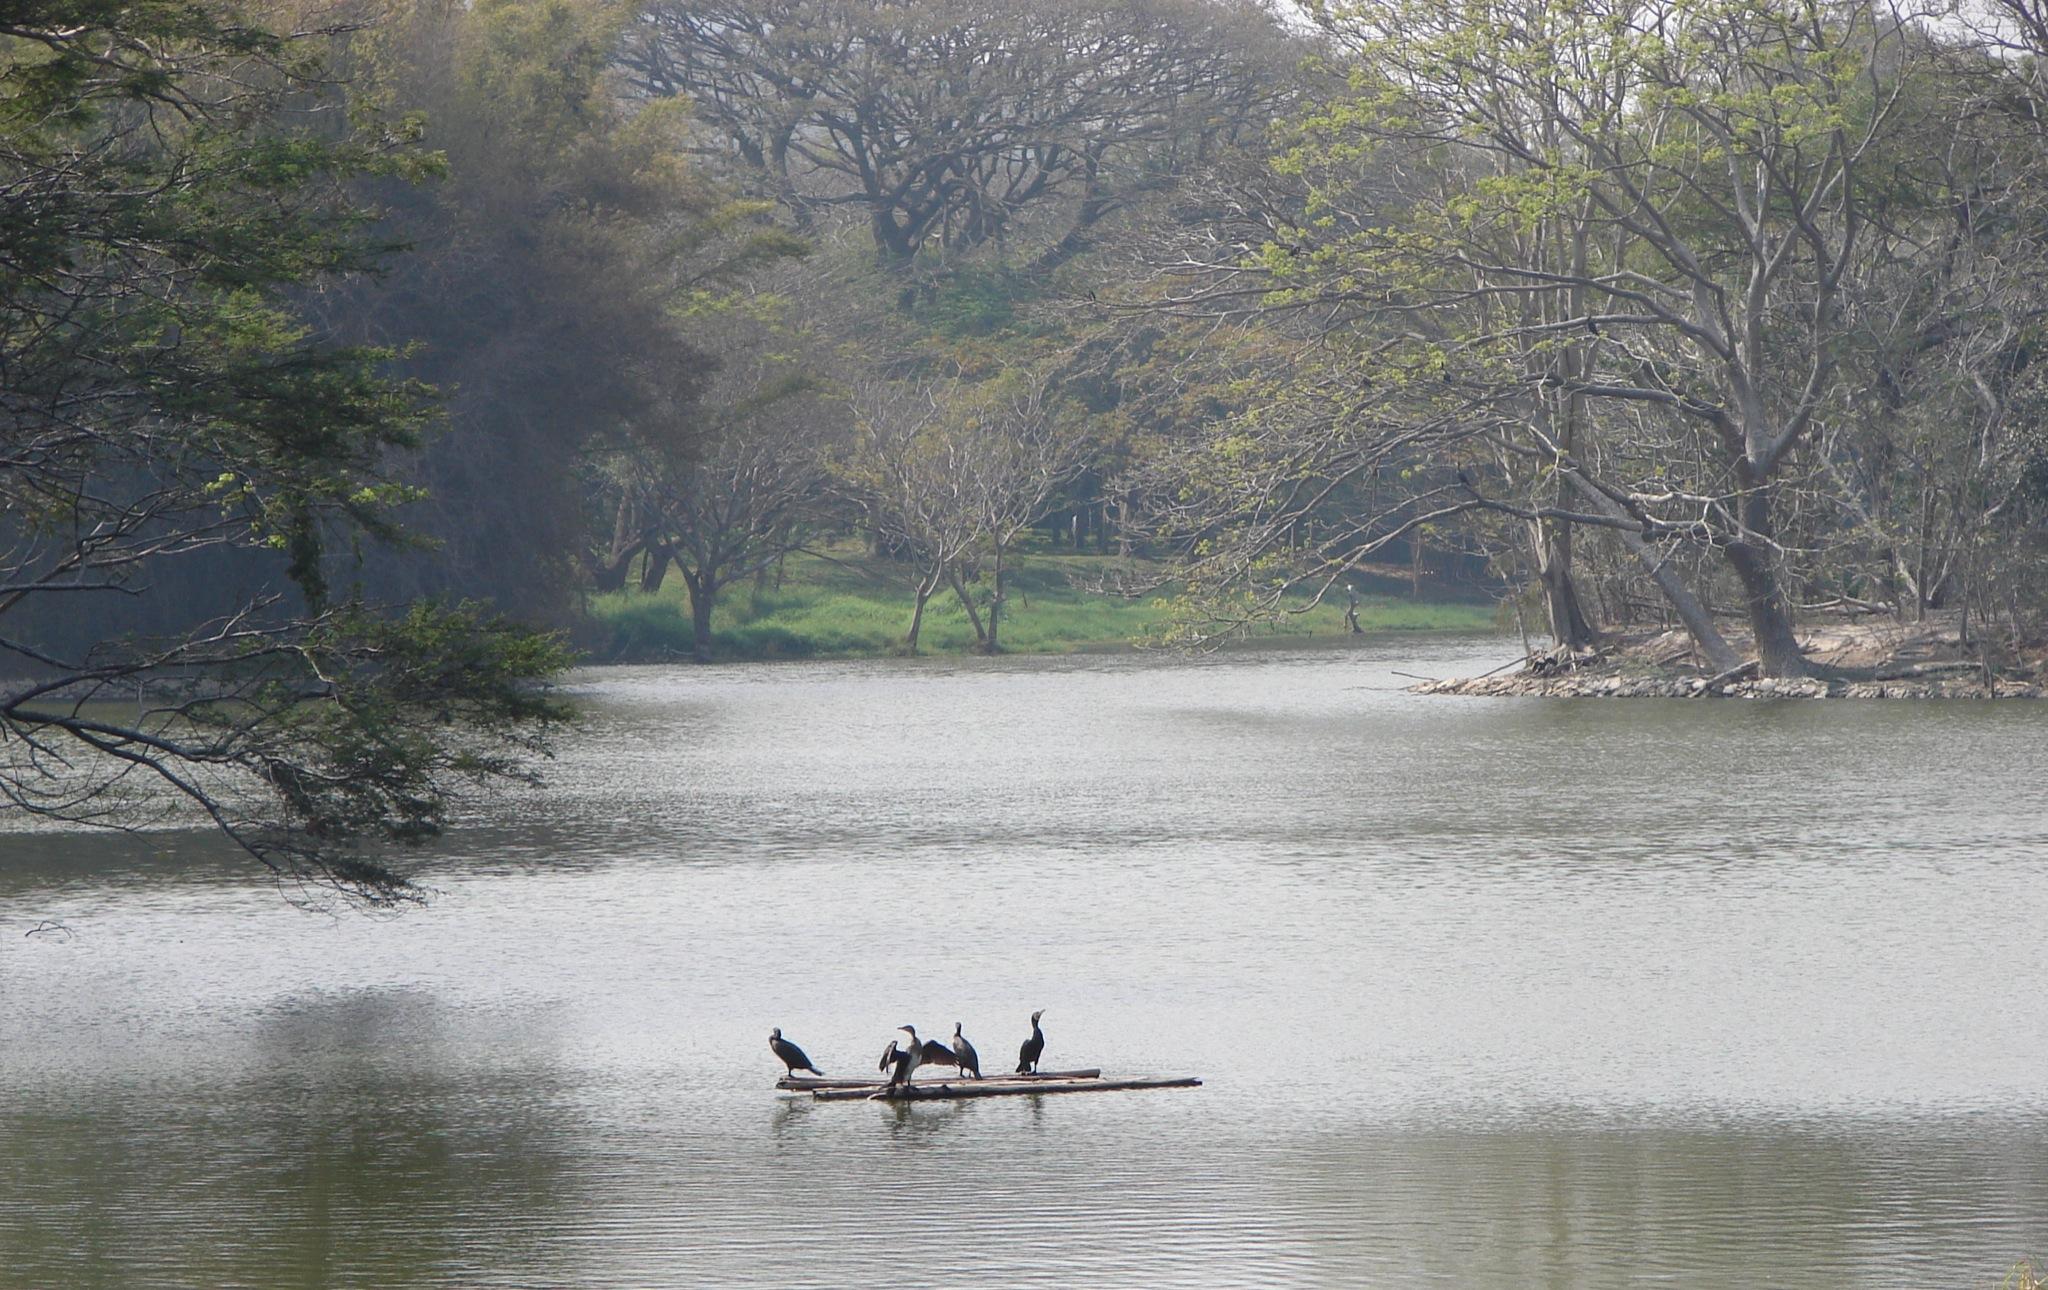 Karanji Lake Amazing Place To Visit When In Mysore